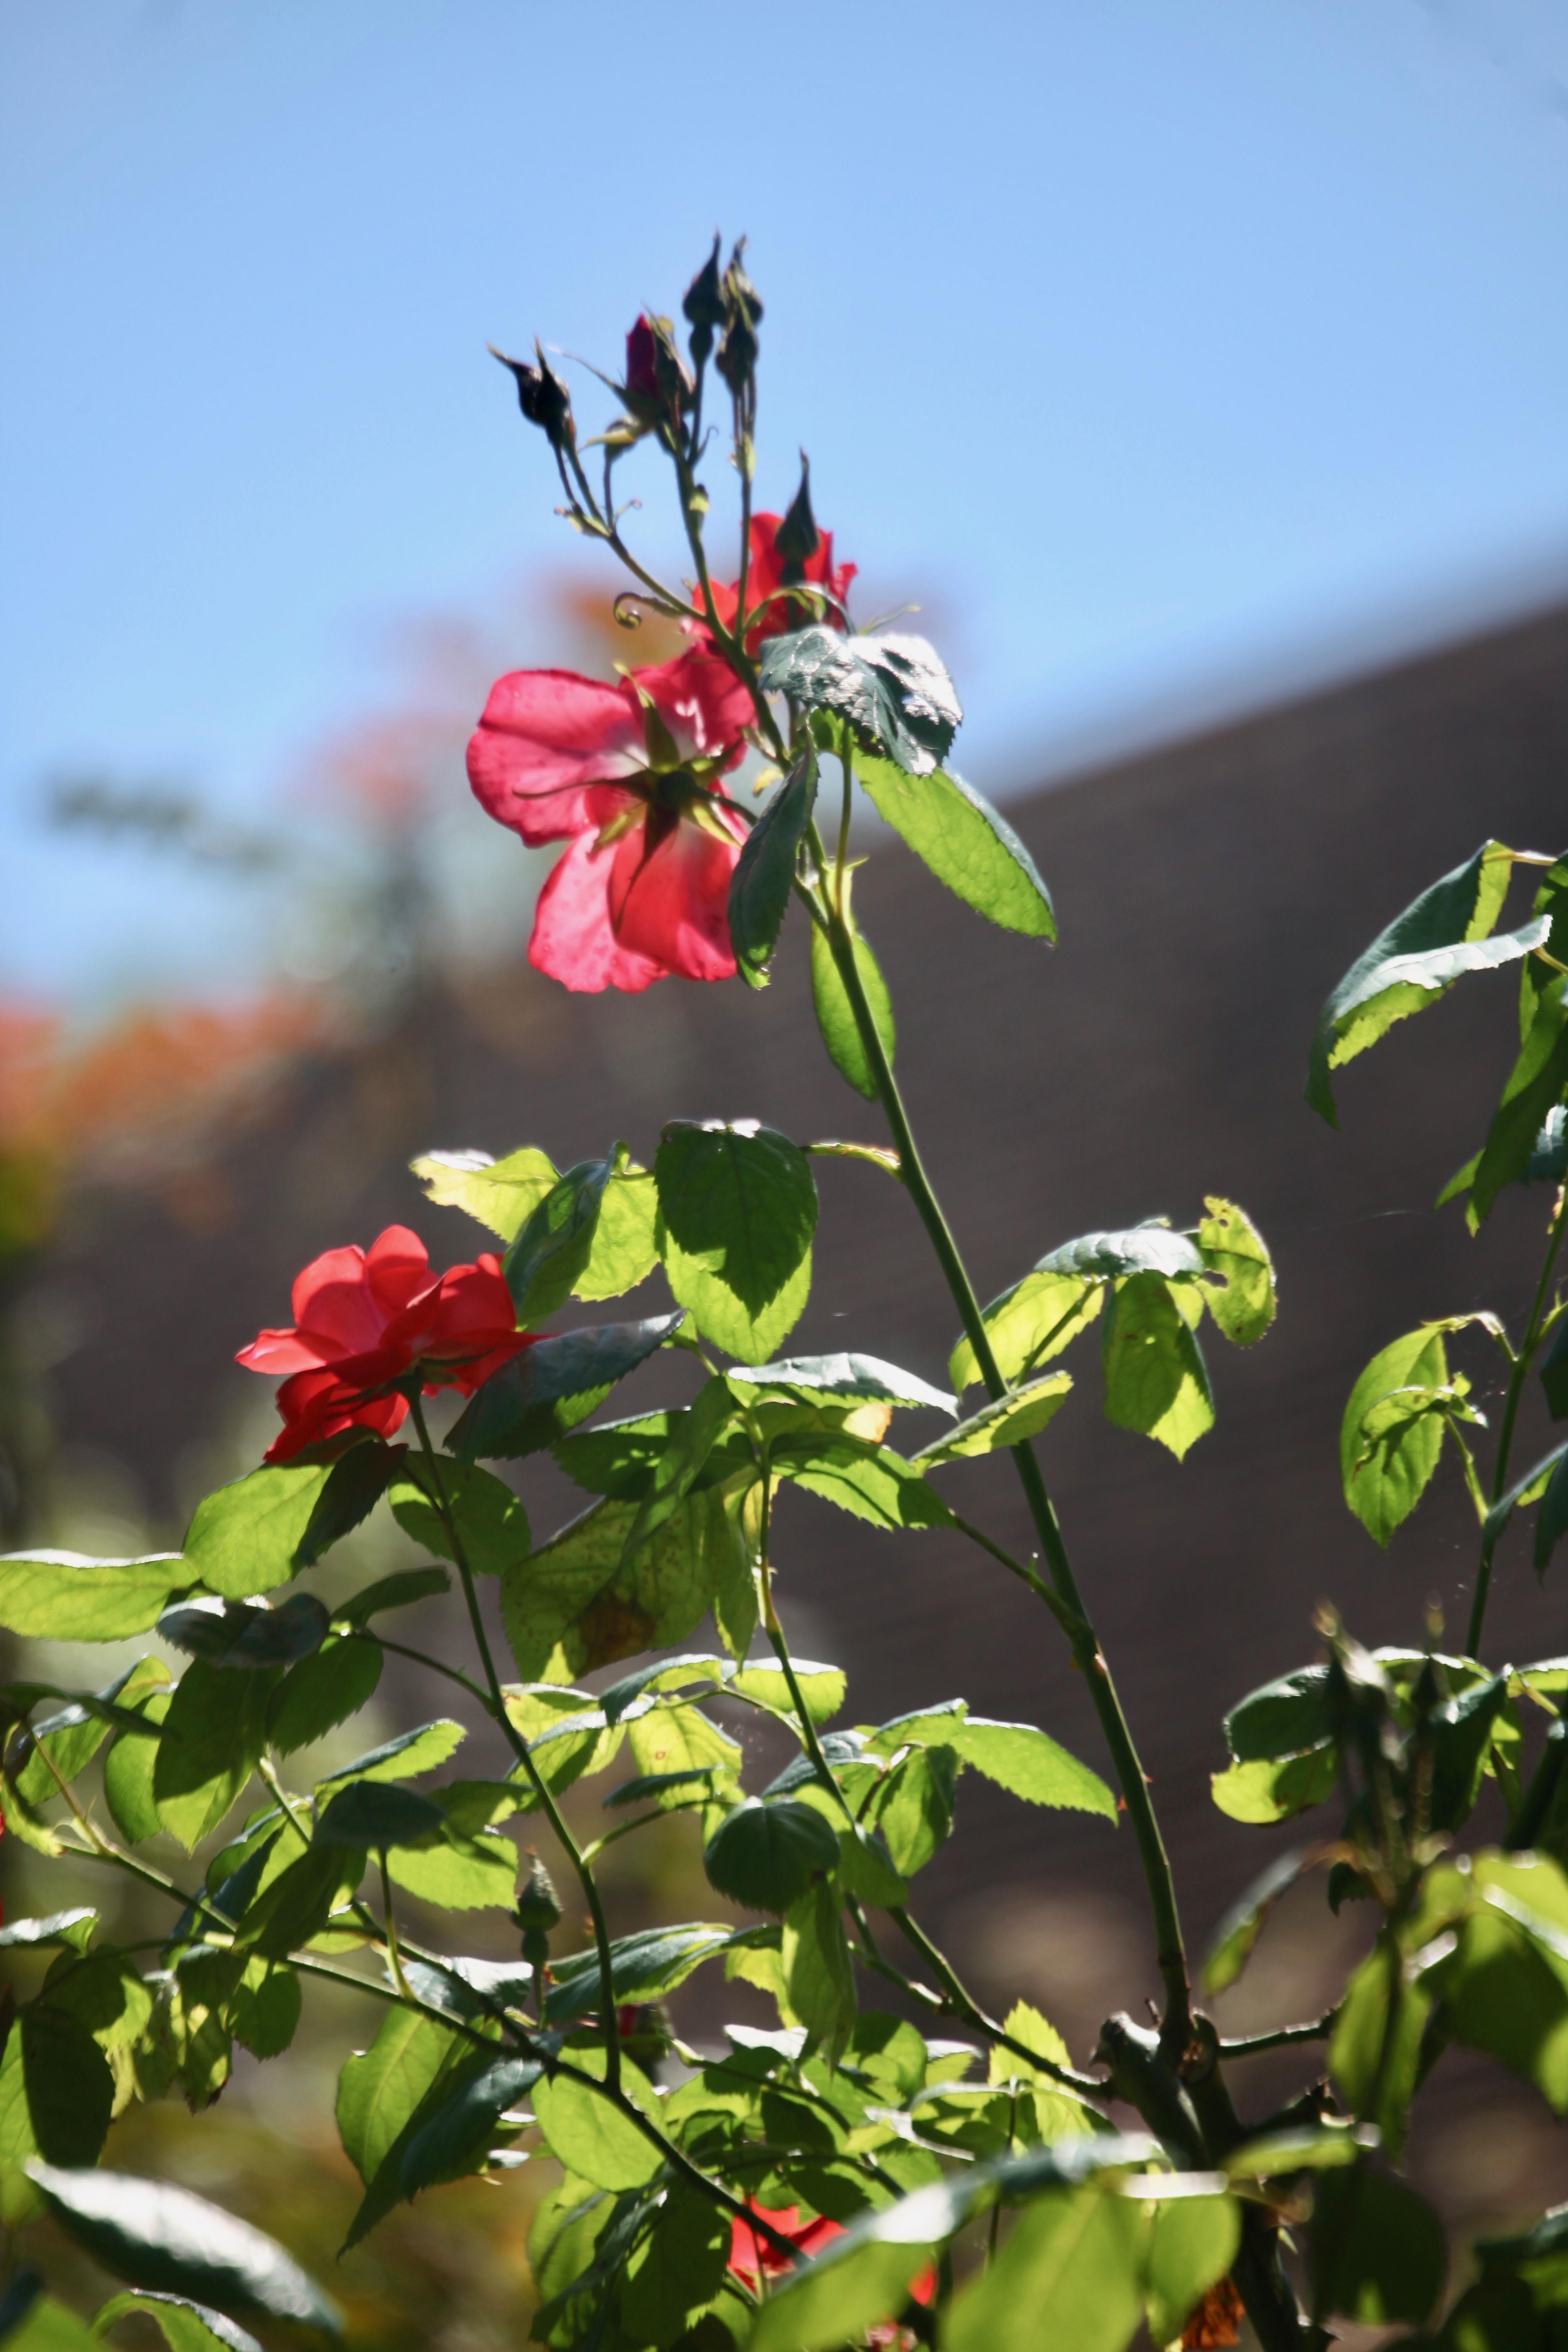 Rose red climber